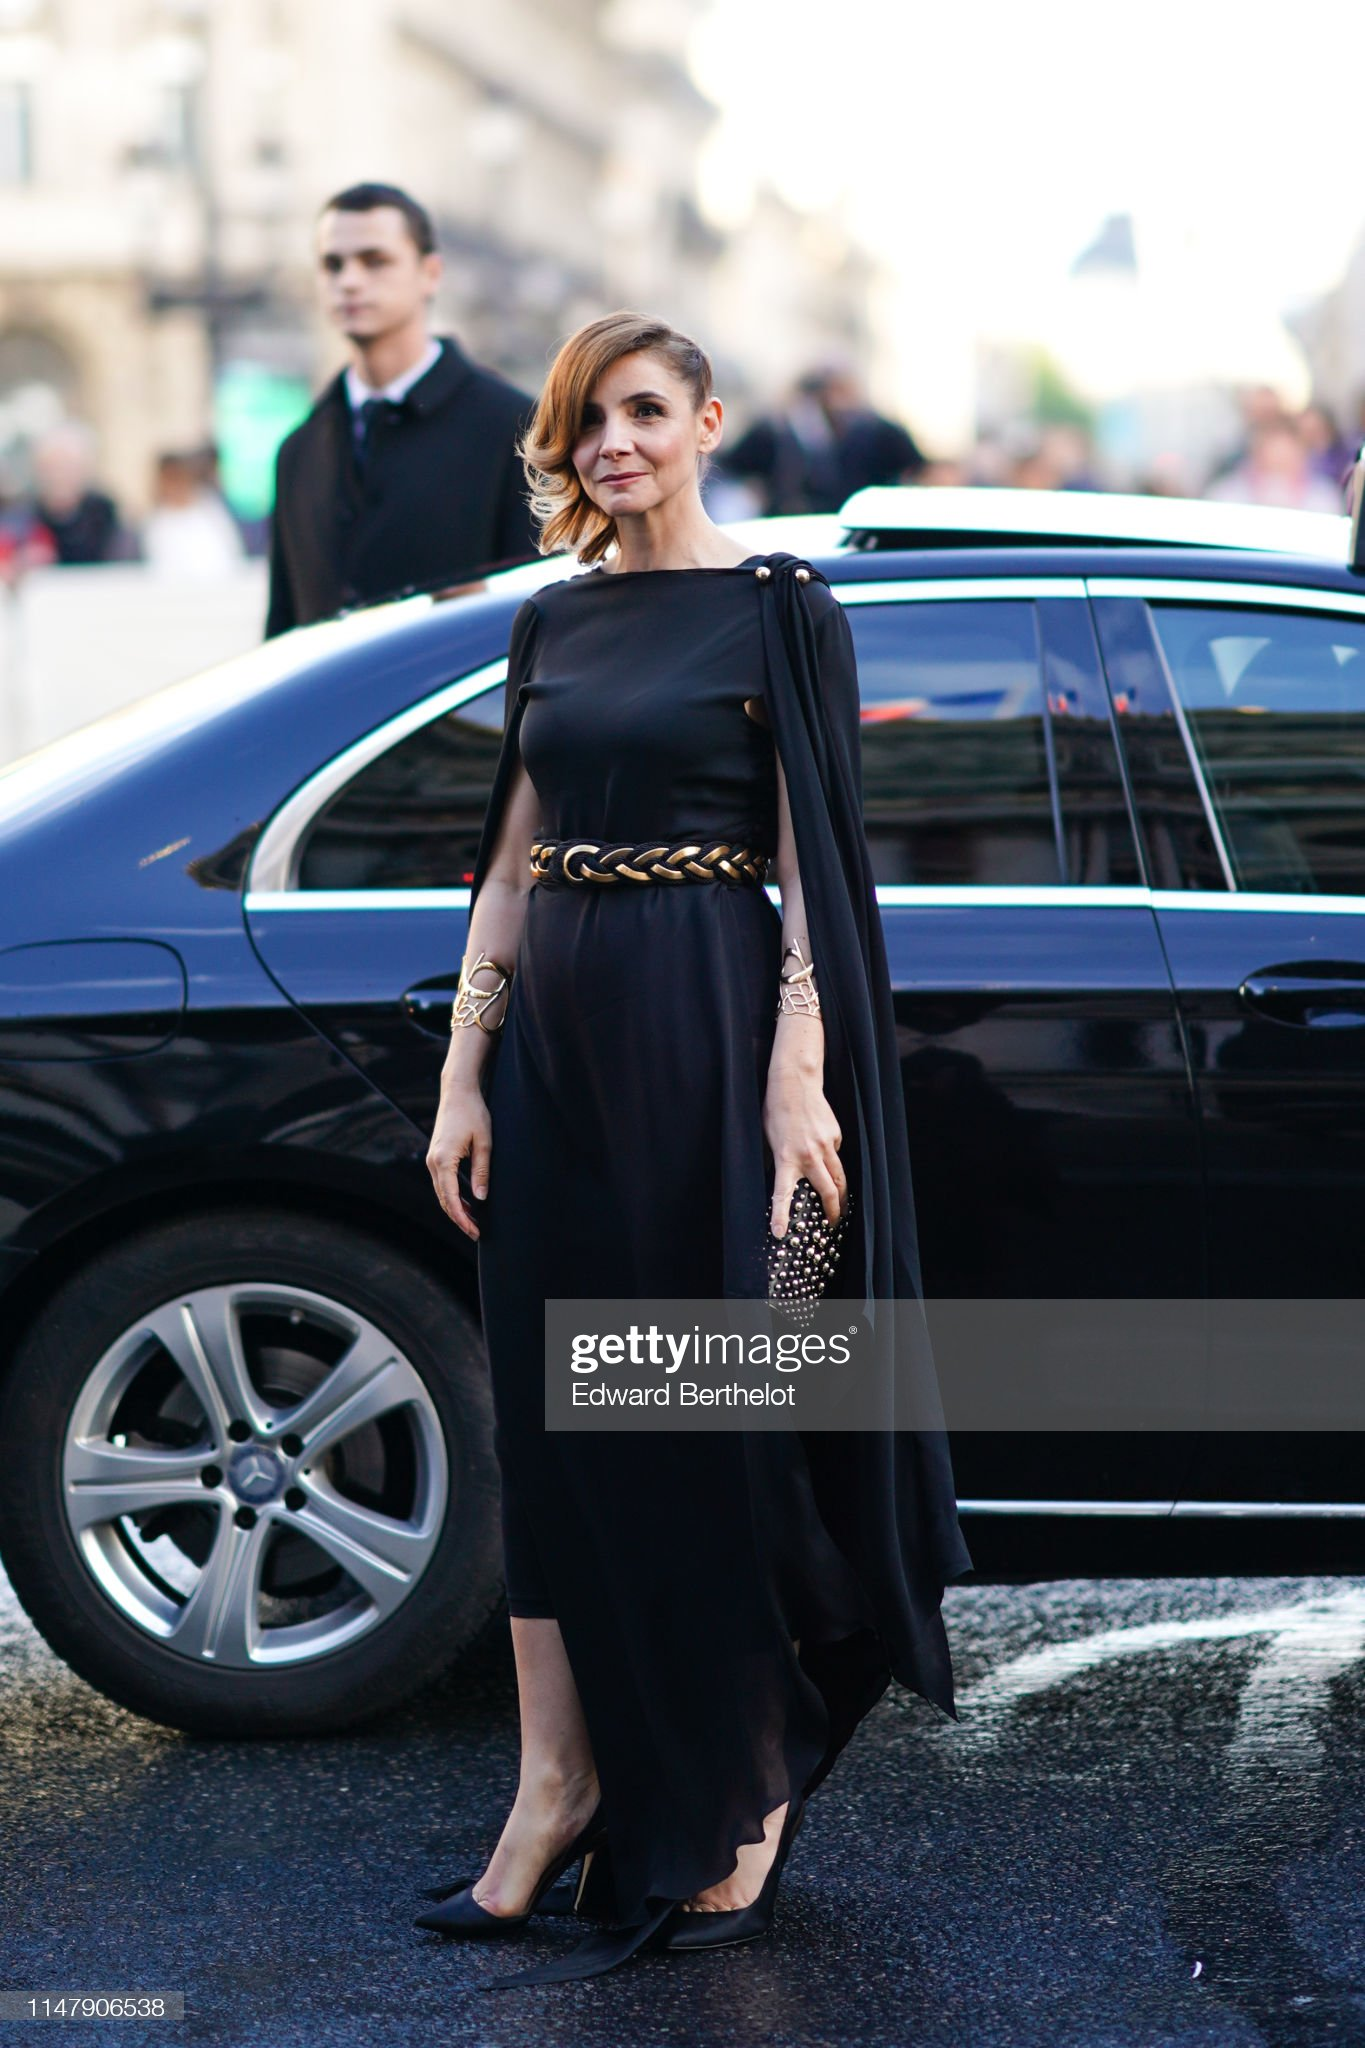 https://media.gettyimages.com/photos/clotilde-courau-wears-a-black-dress-a-golden-belt-golden-bracelets-a-picture-id1147906538?s=2048x2048